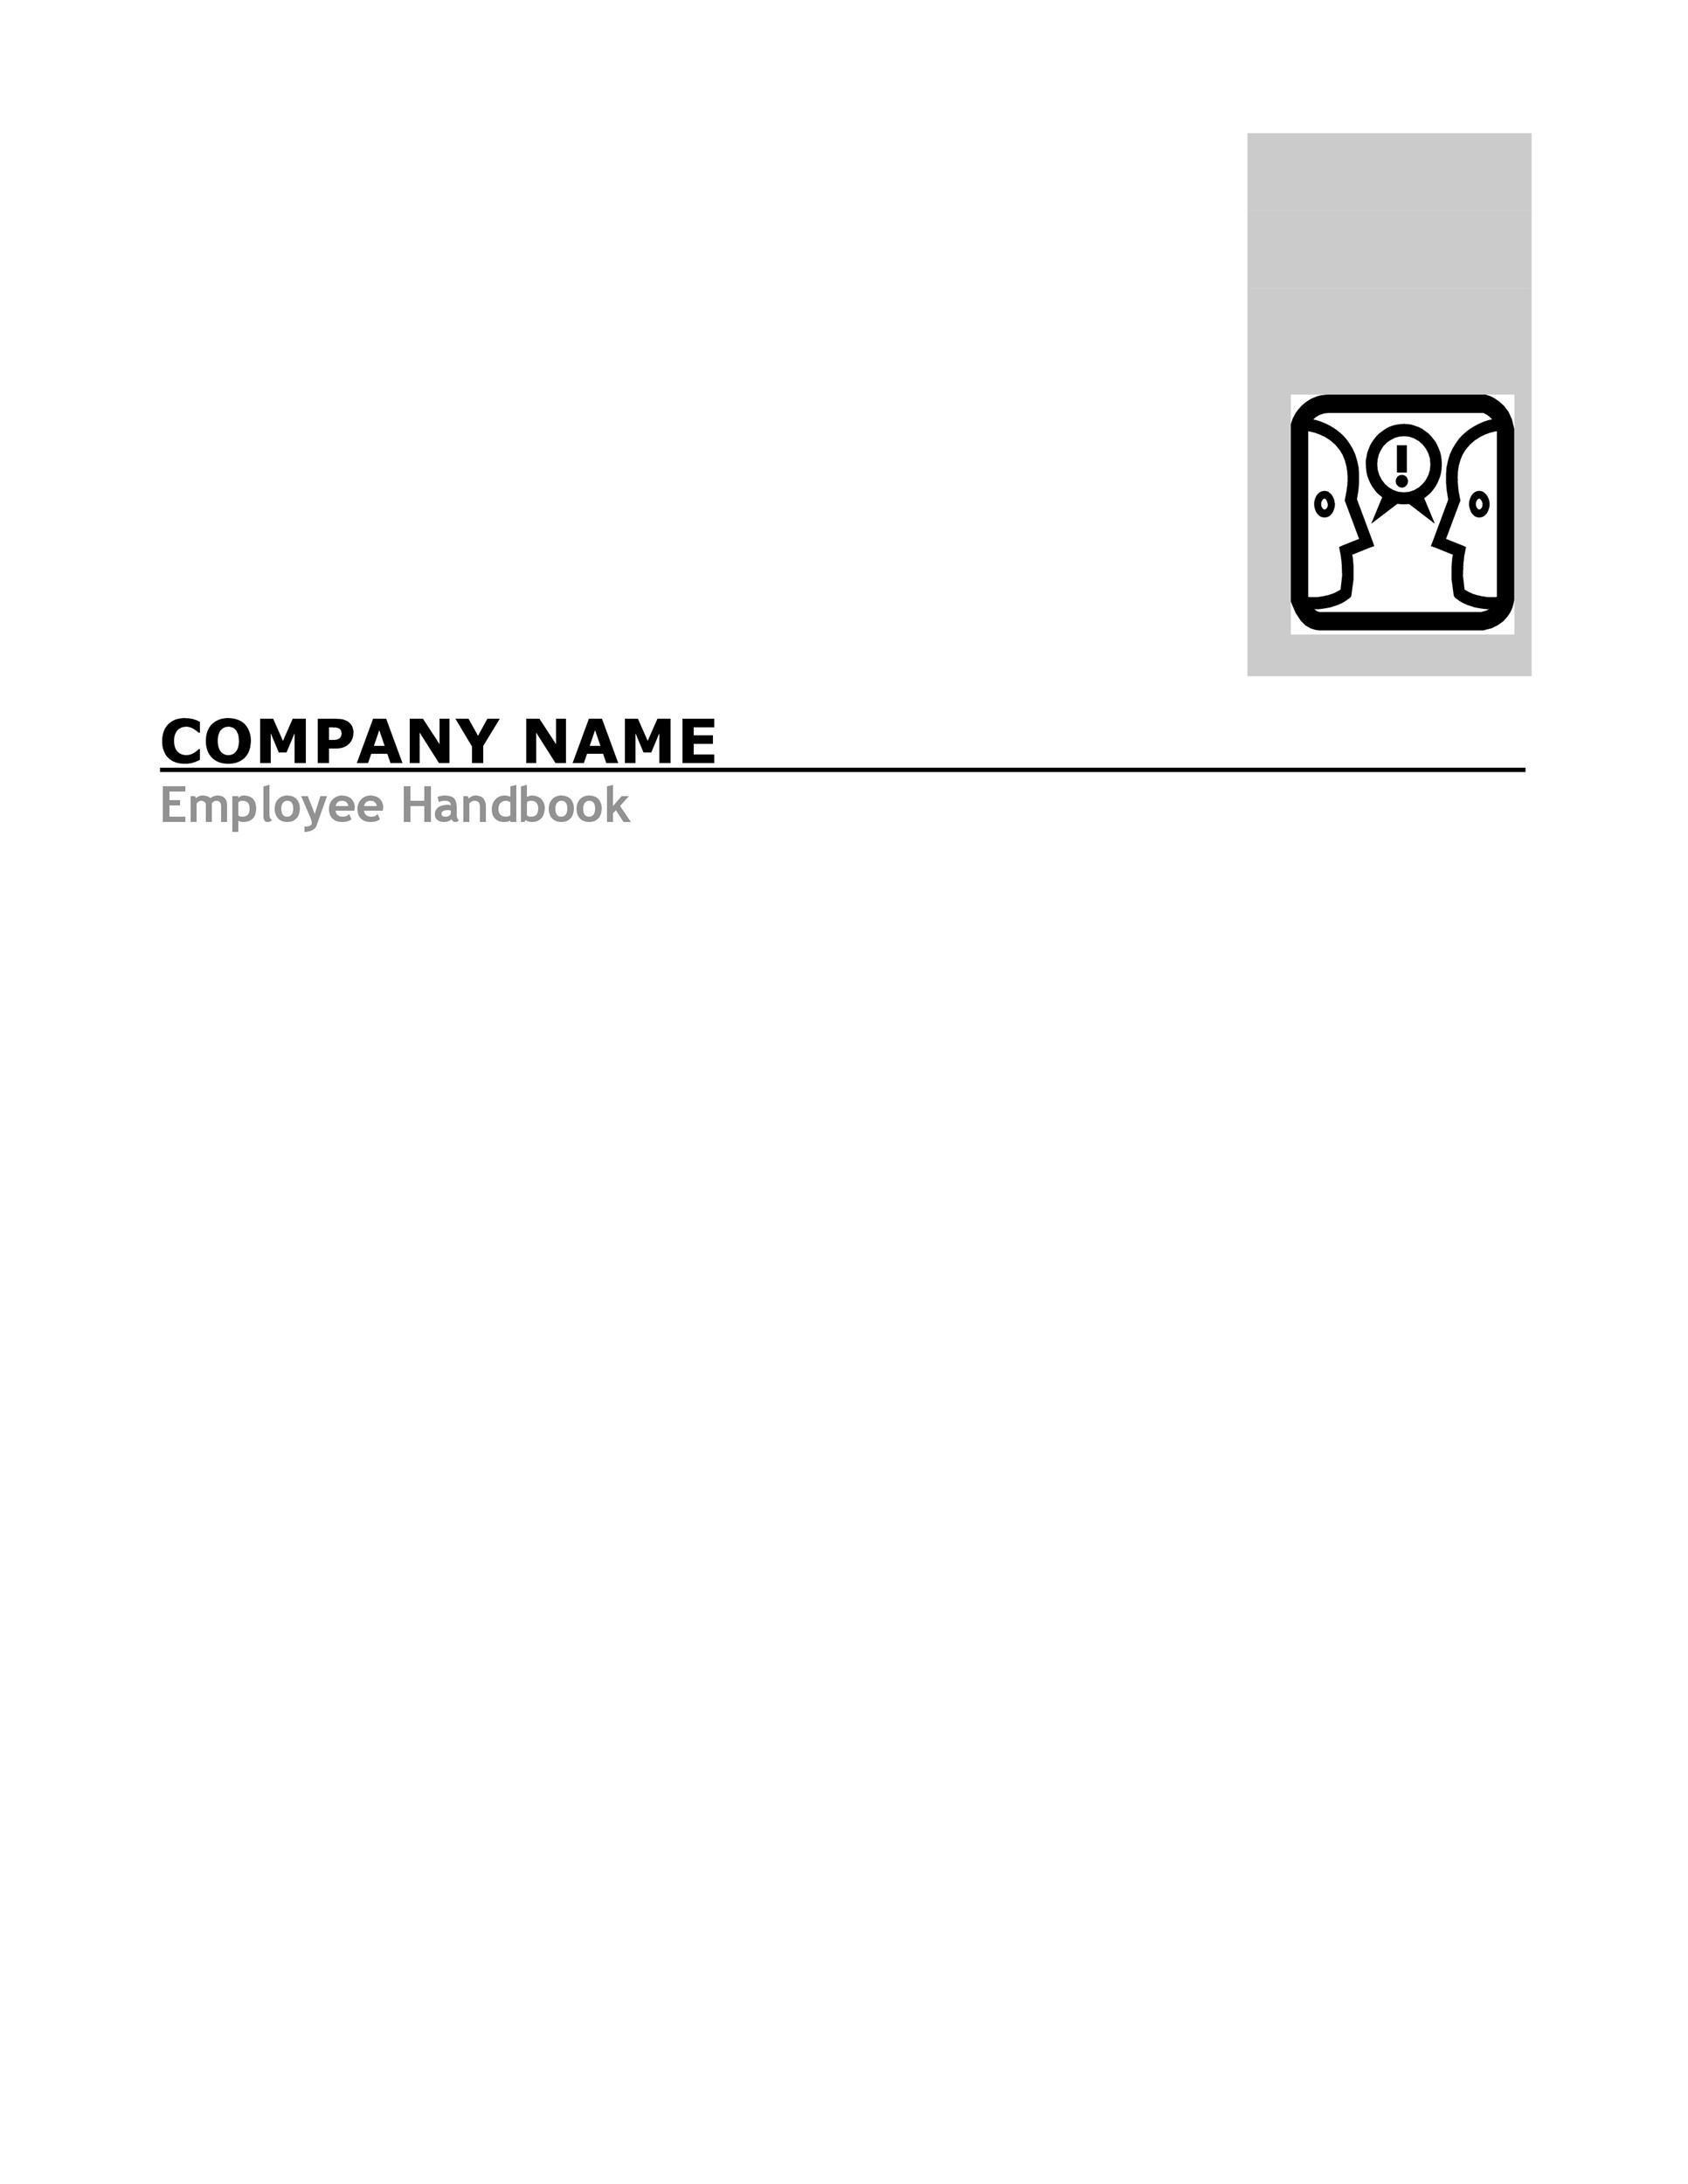 Free employee handbook template 28